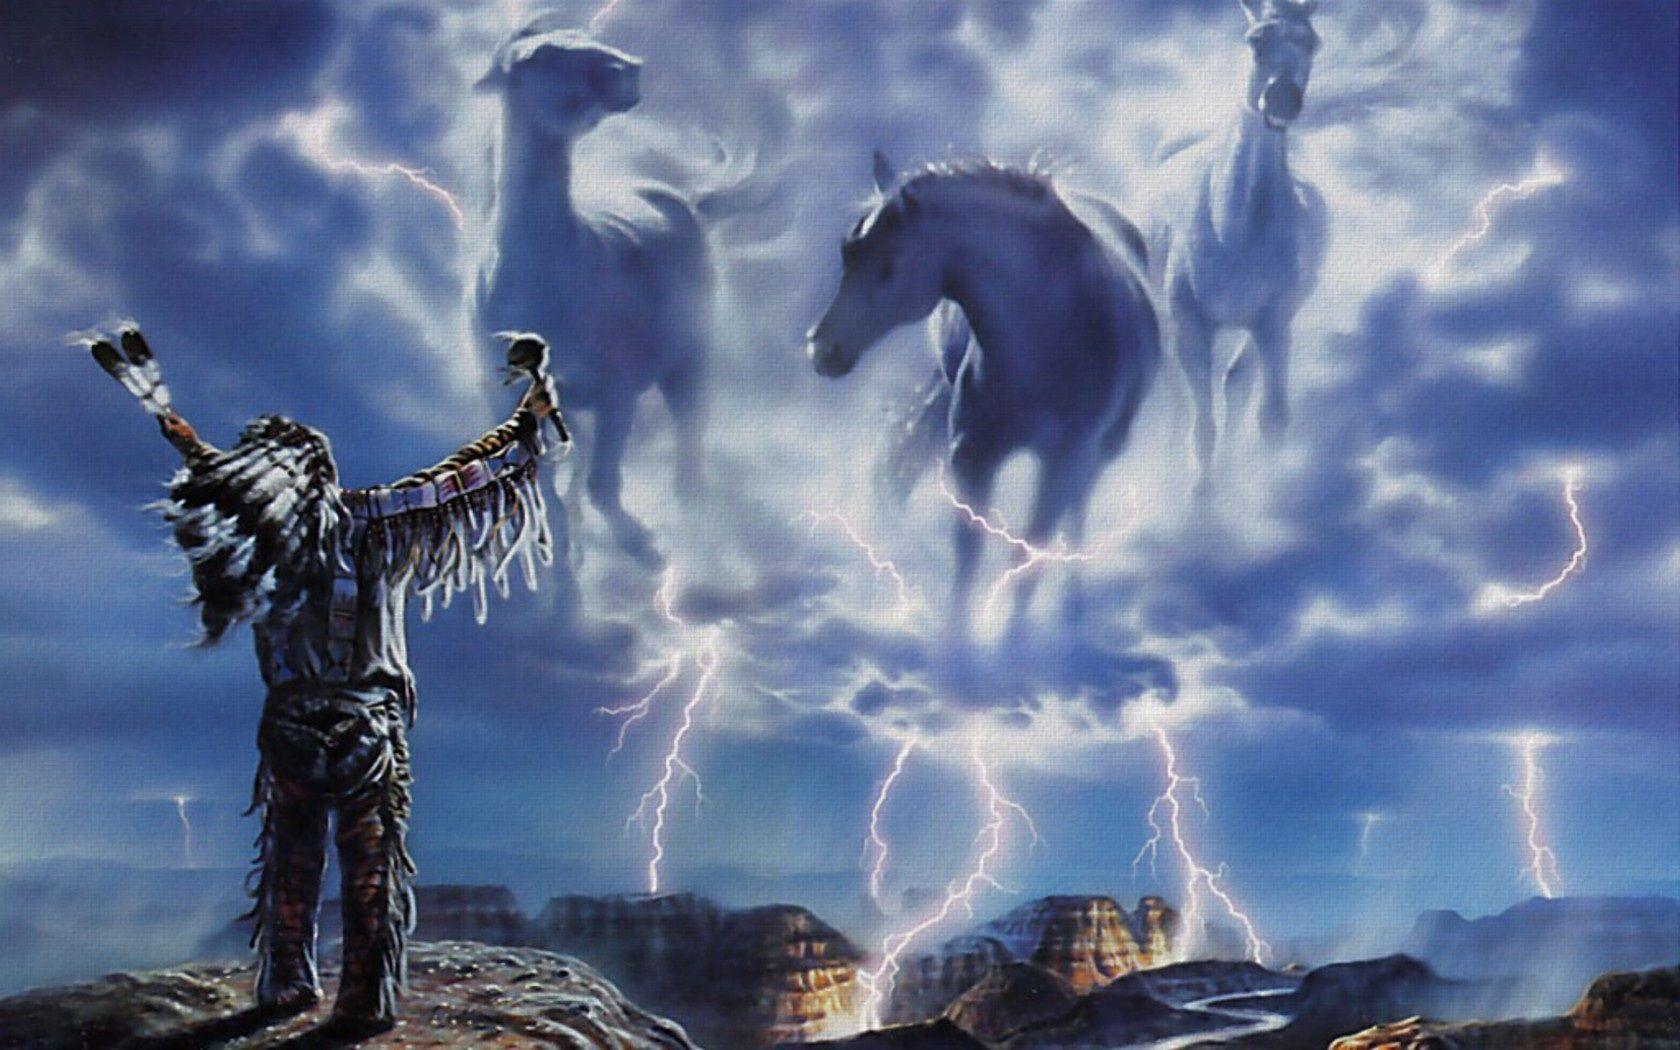 Download Wallpaper Horse Lightning - ce4a34e7d3966e3eb424c38d97812987  Image_84616.jpg